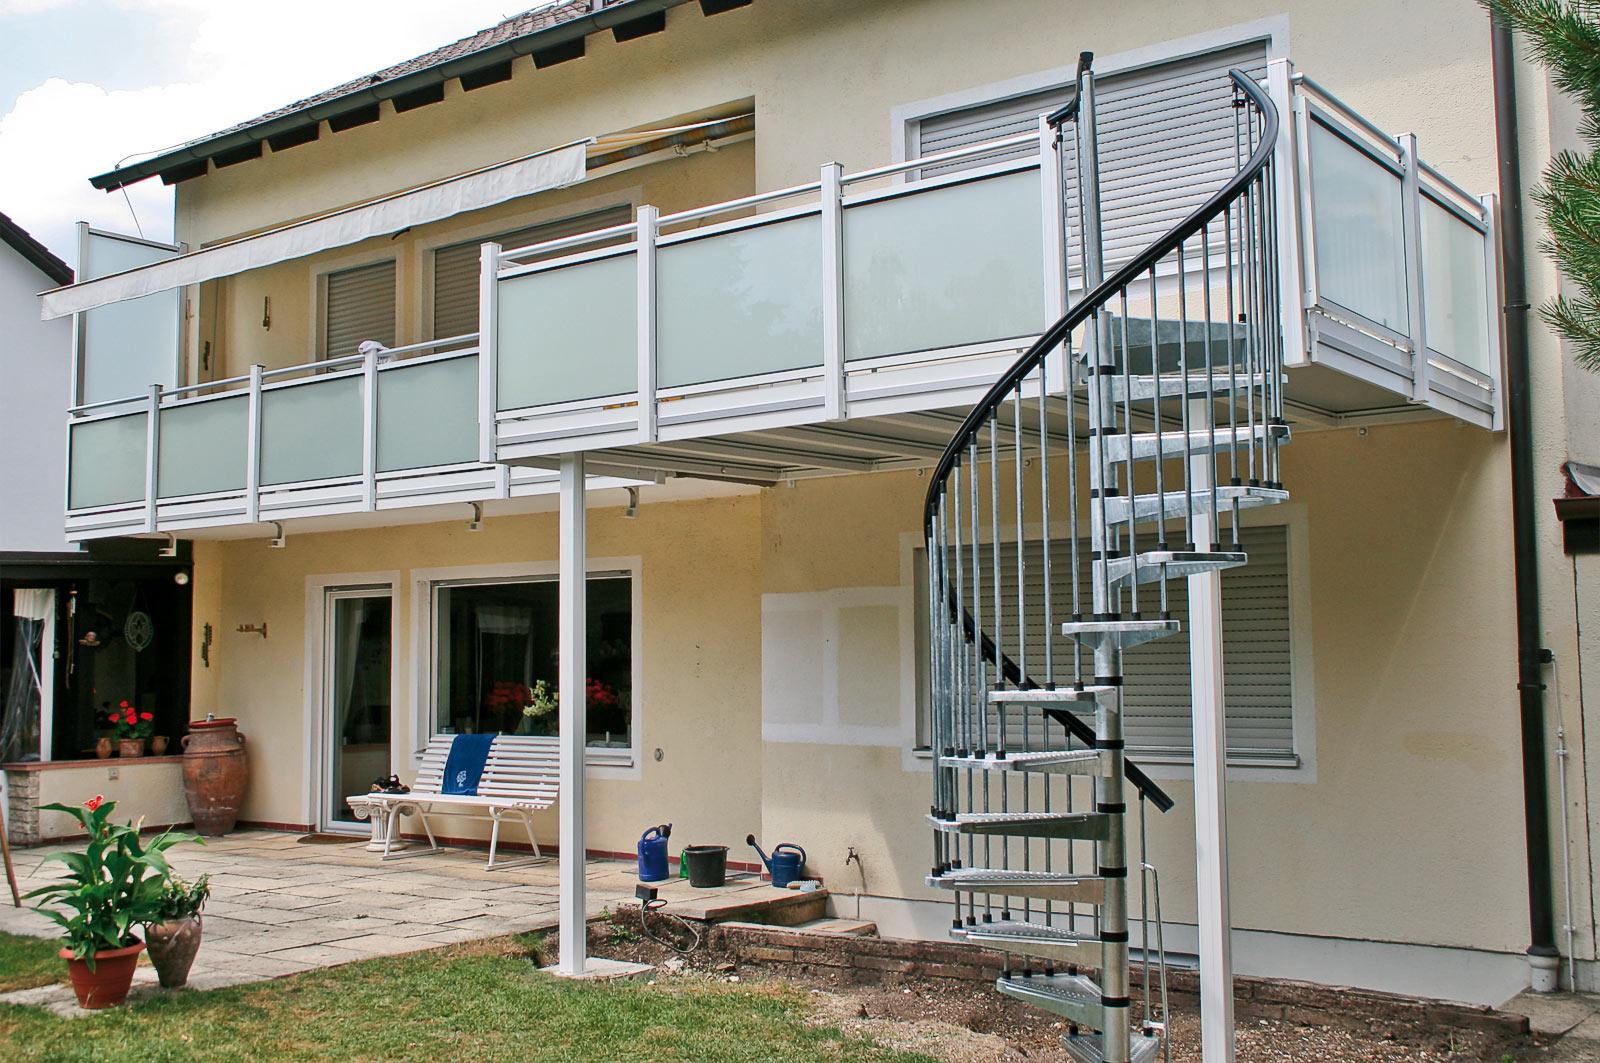 linder balkone z une alu alubalkone alu balkonanbauten alu berdachungen alu balkonanbauten. Black Bedroom Furniture Sets. Home Design Ideas